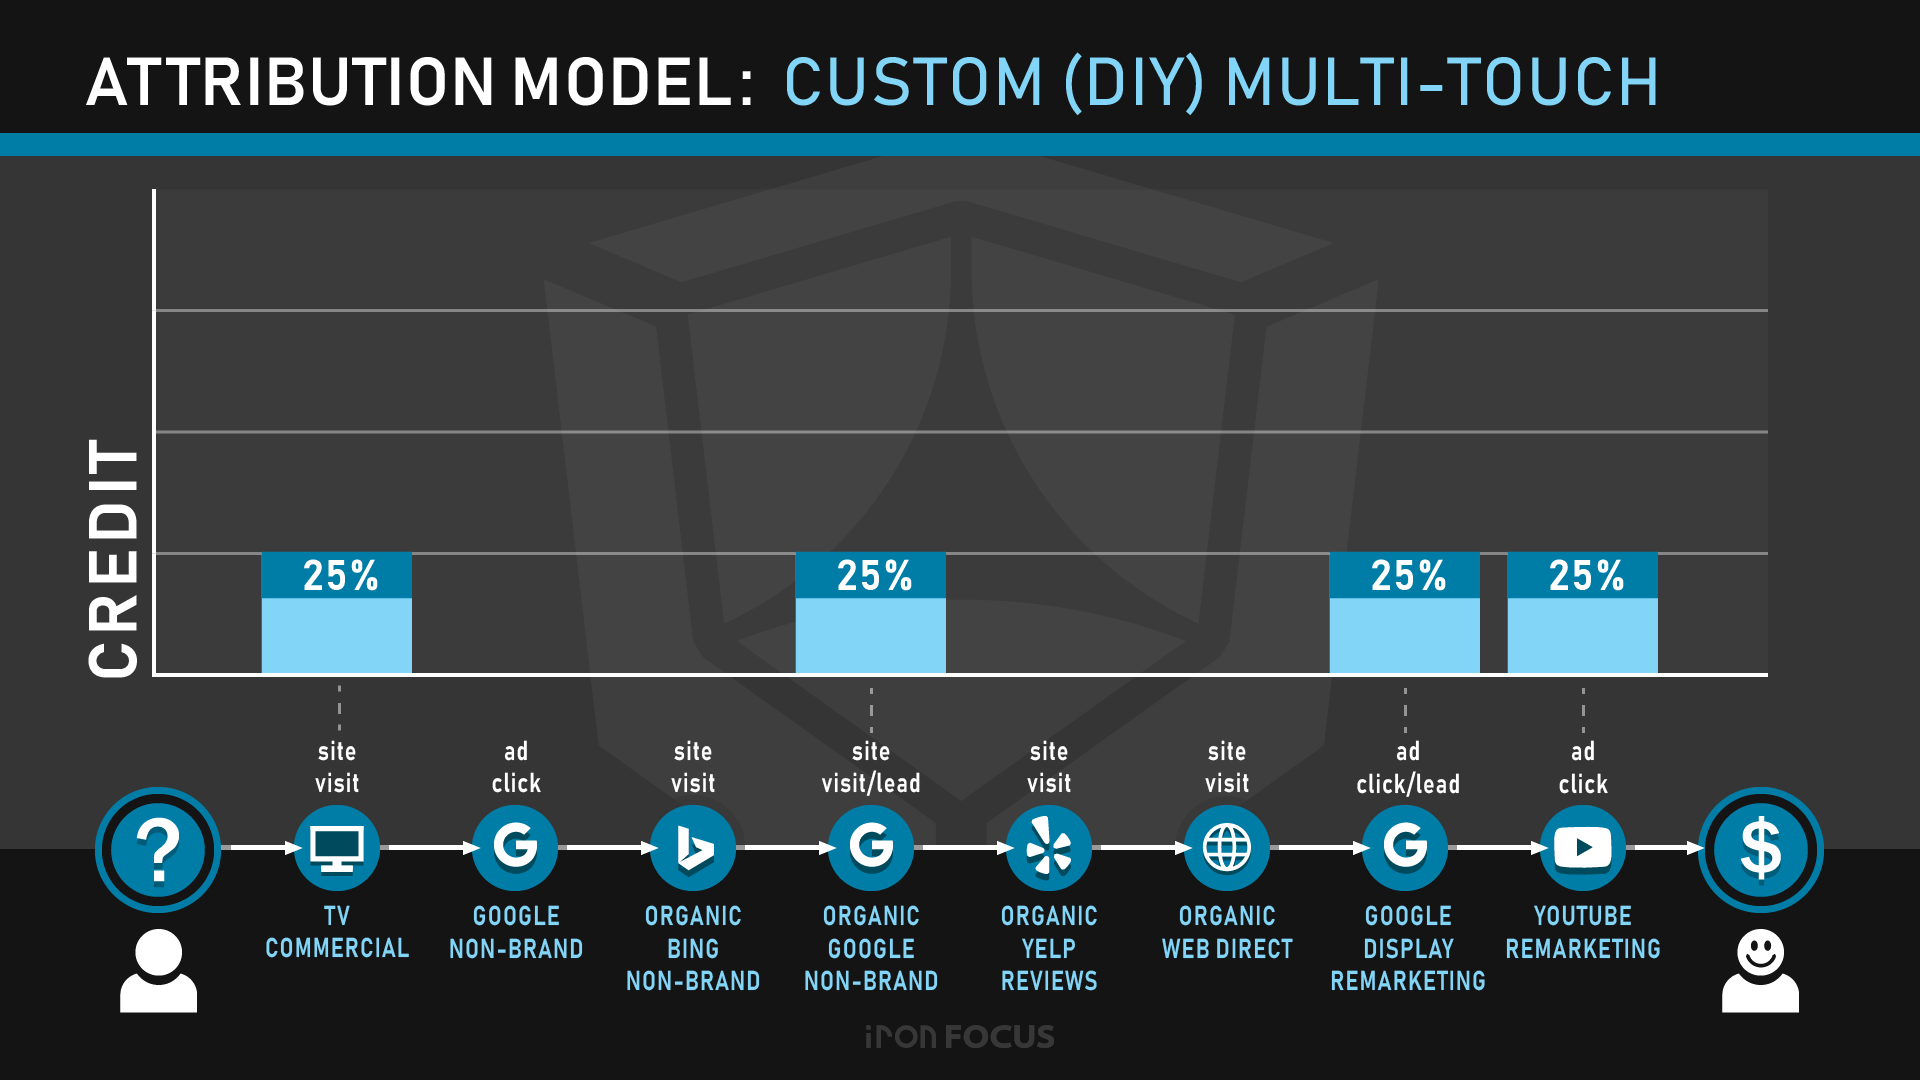 Attribution Model: Custom (DIY) Multi-Touch